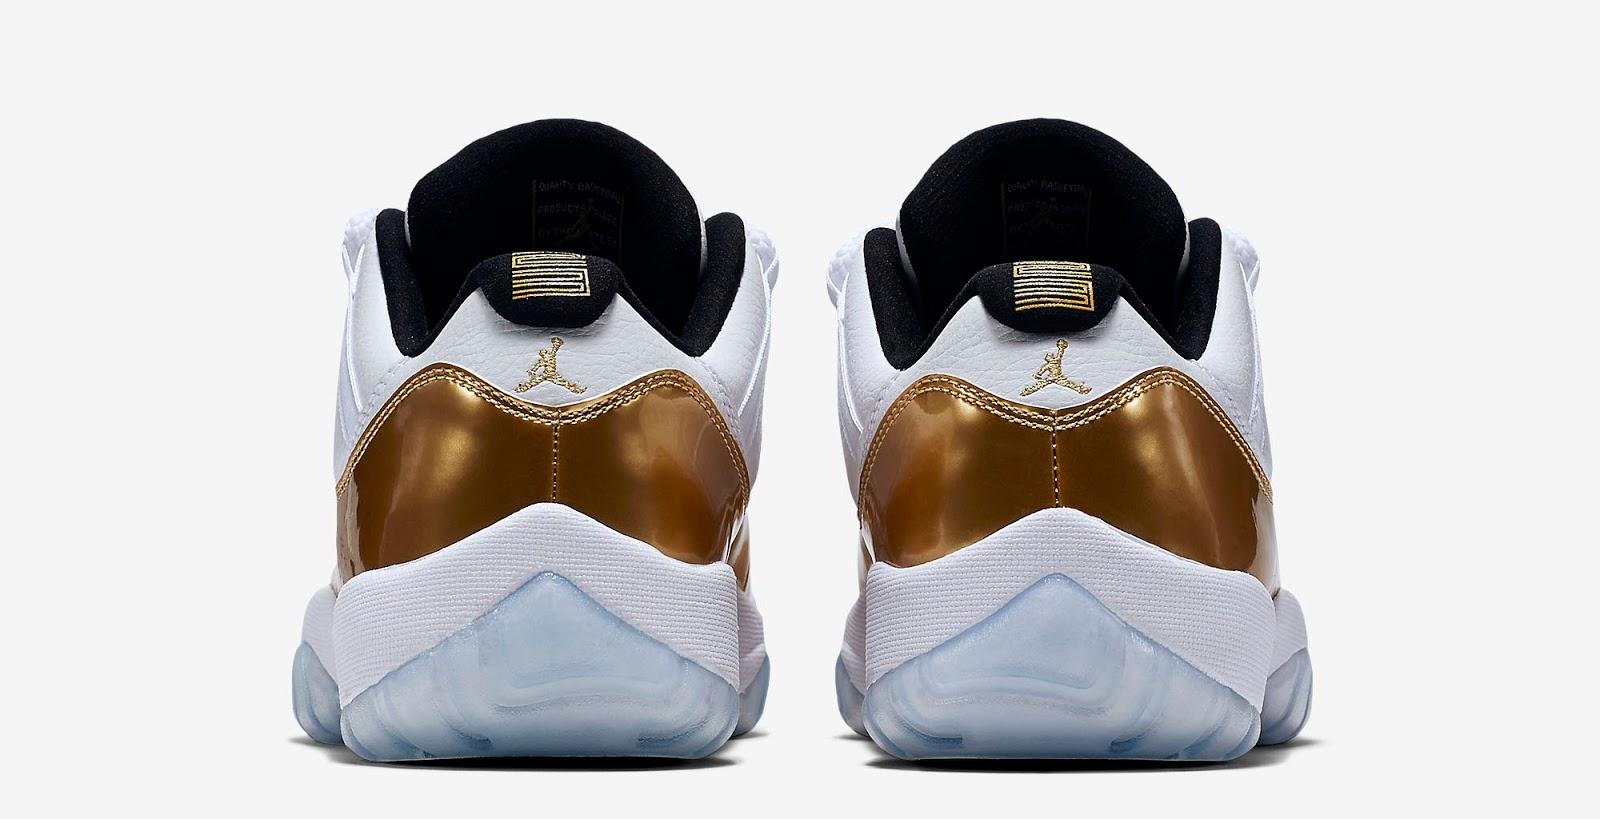 new arrival 850a0 30677 ajordanxi Your  1 Source For Sneaker Release Dates  Air Jordan 11 ...